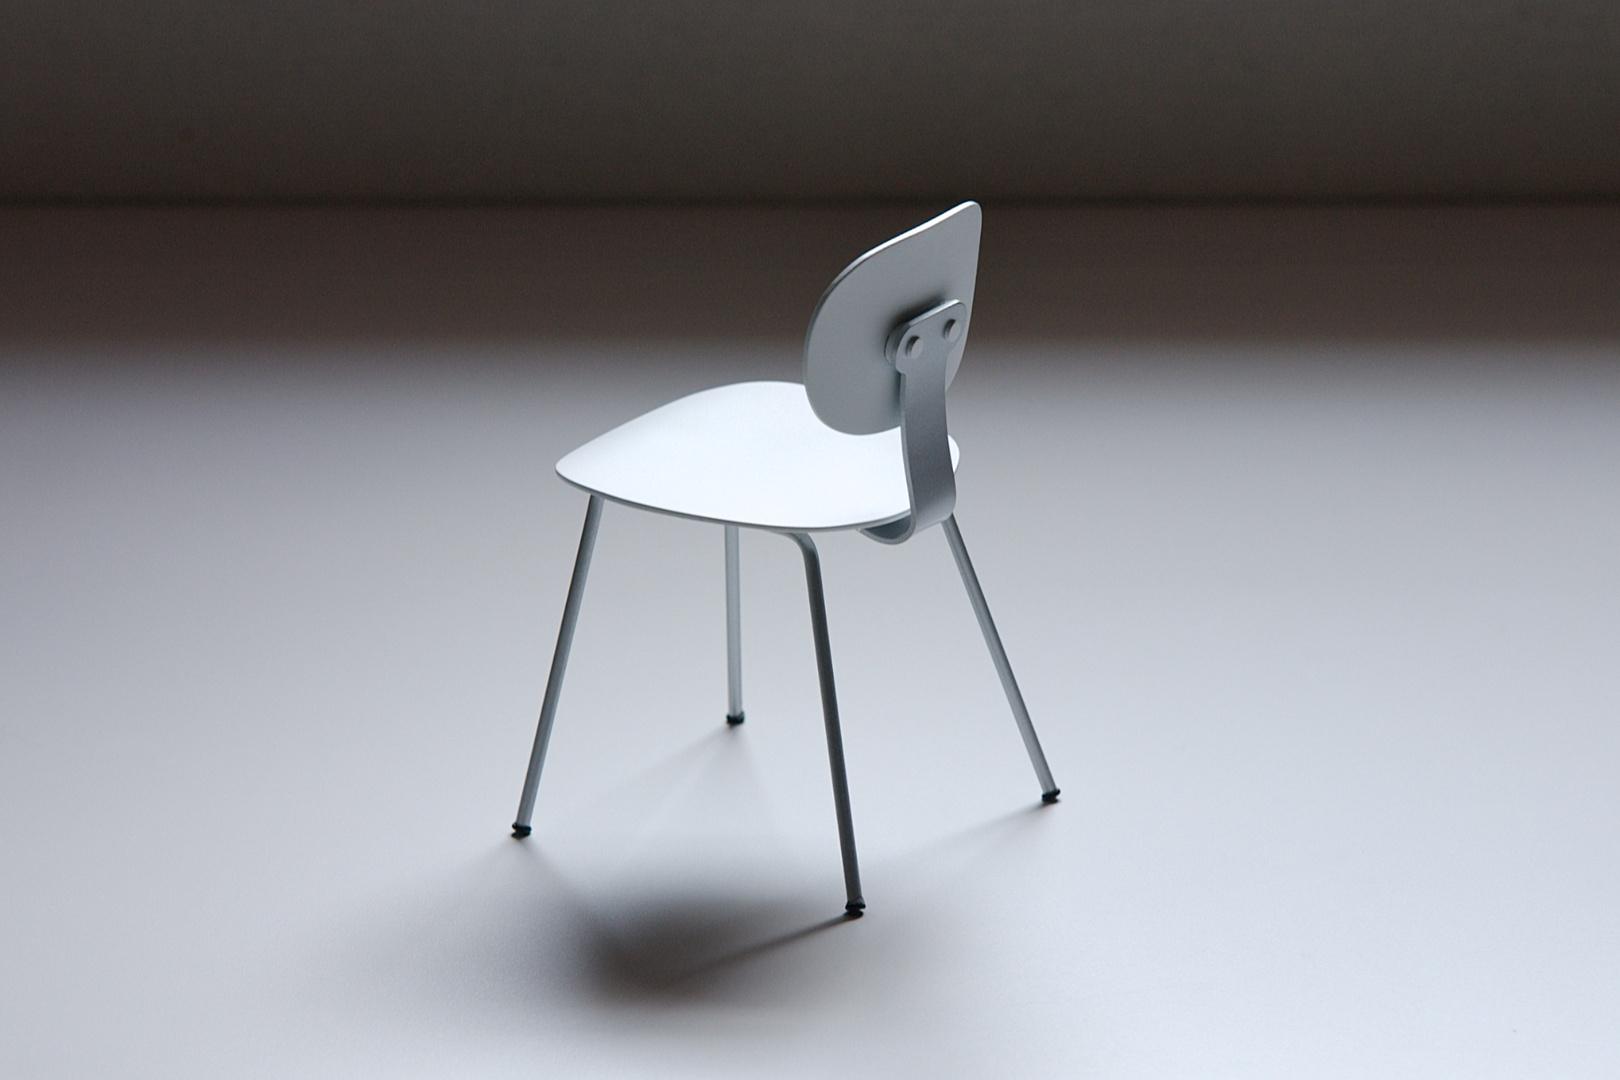 muji office chair. muji office. office chair